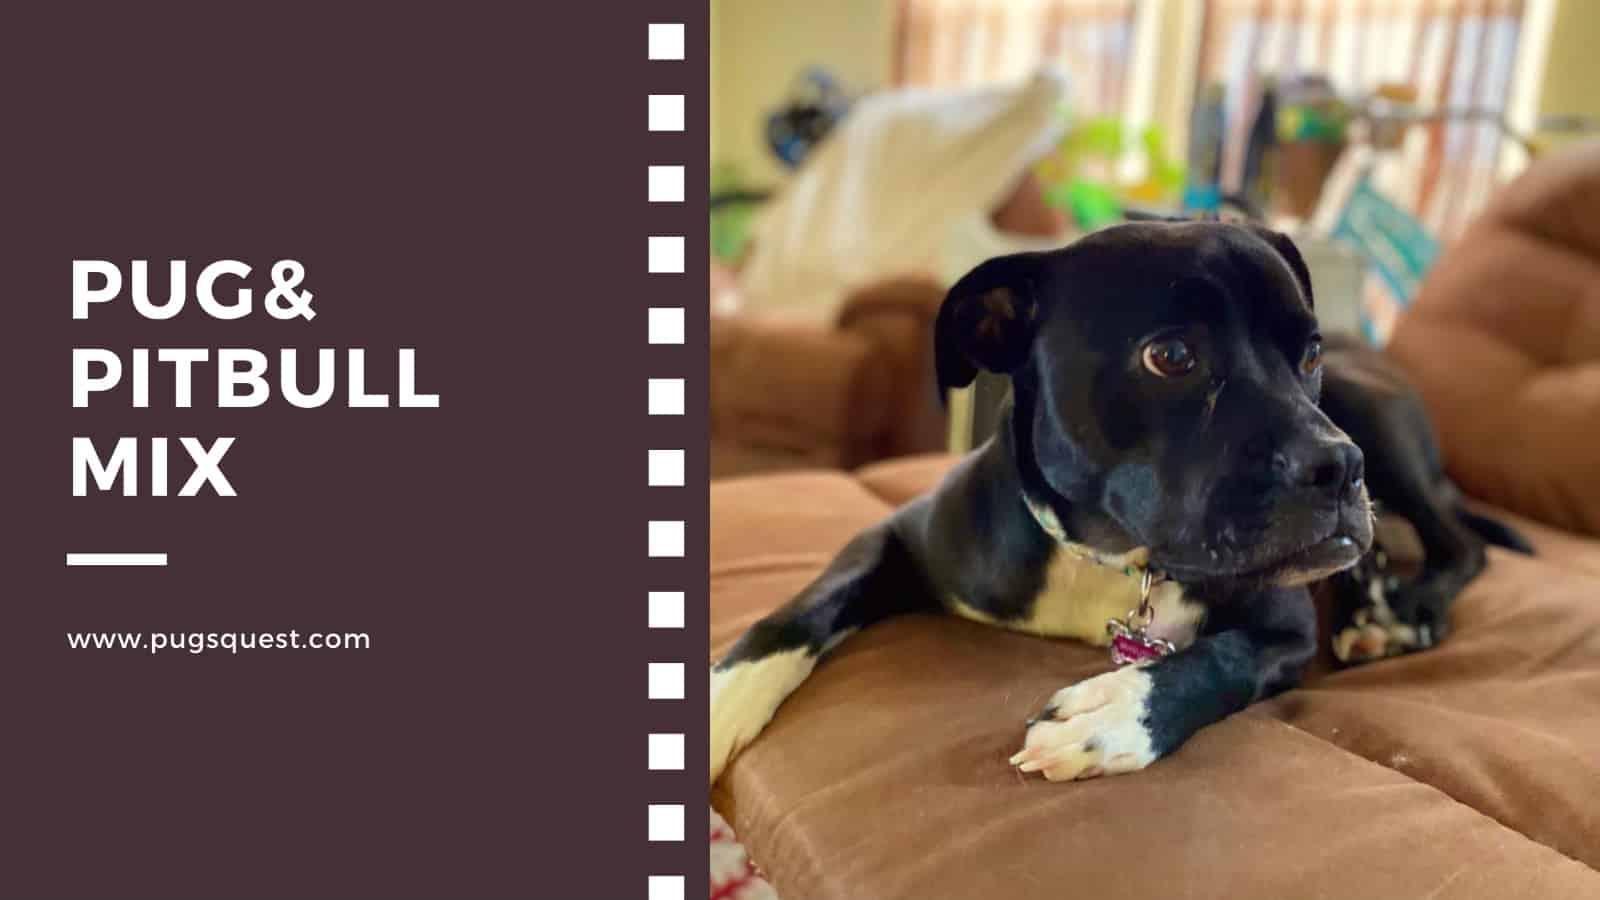 Pug& pitbull mix